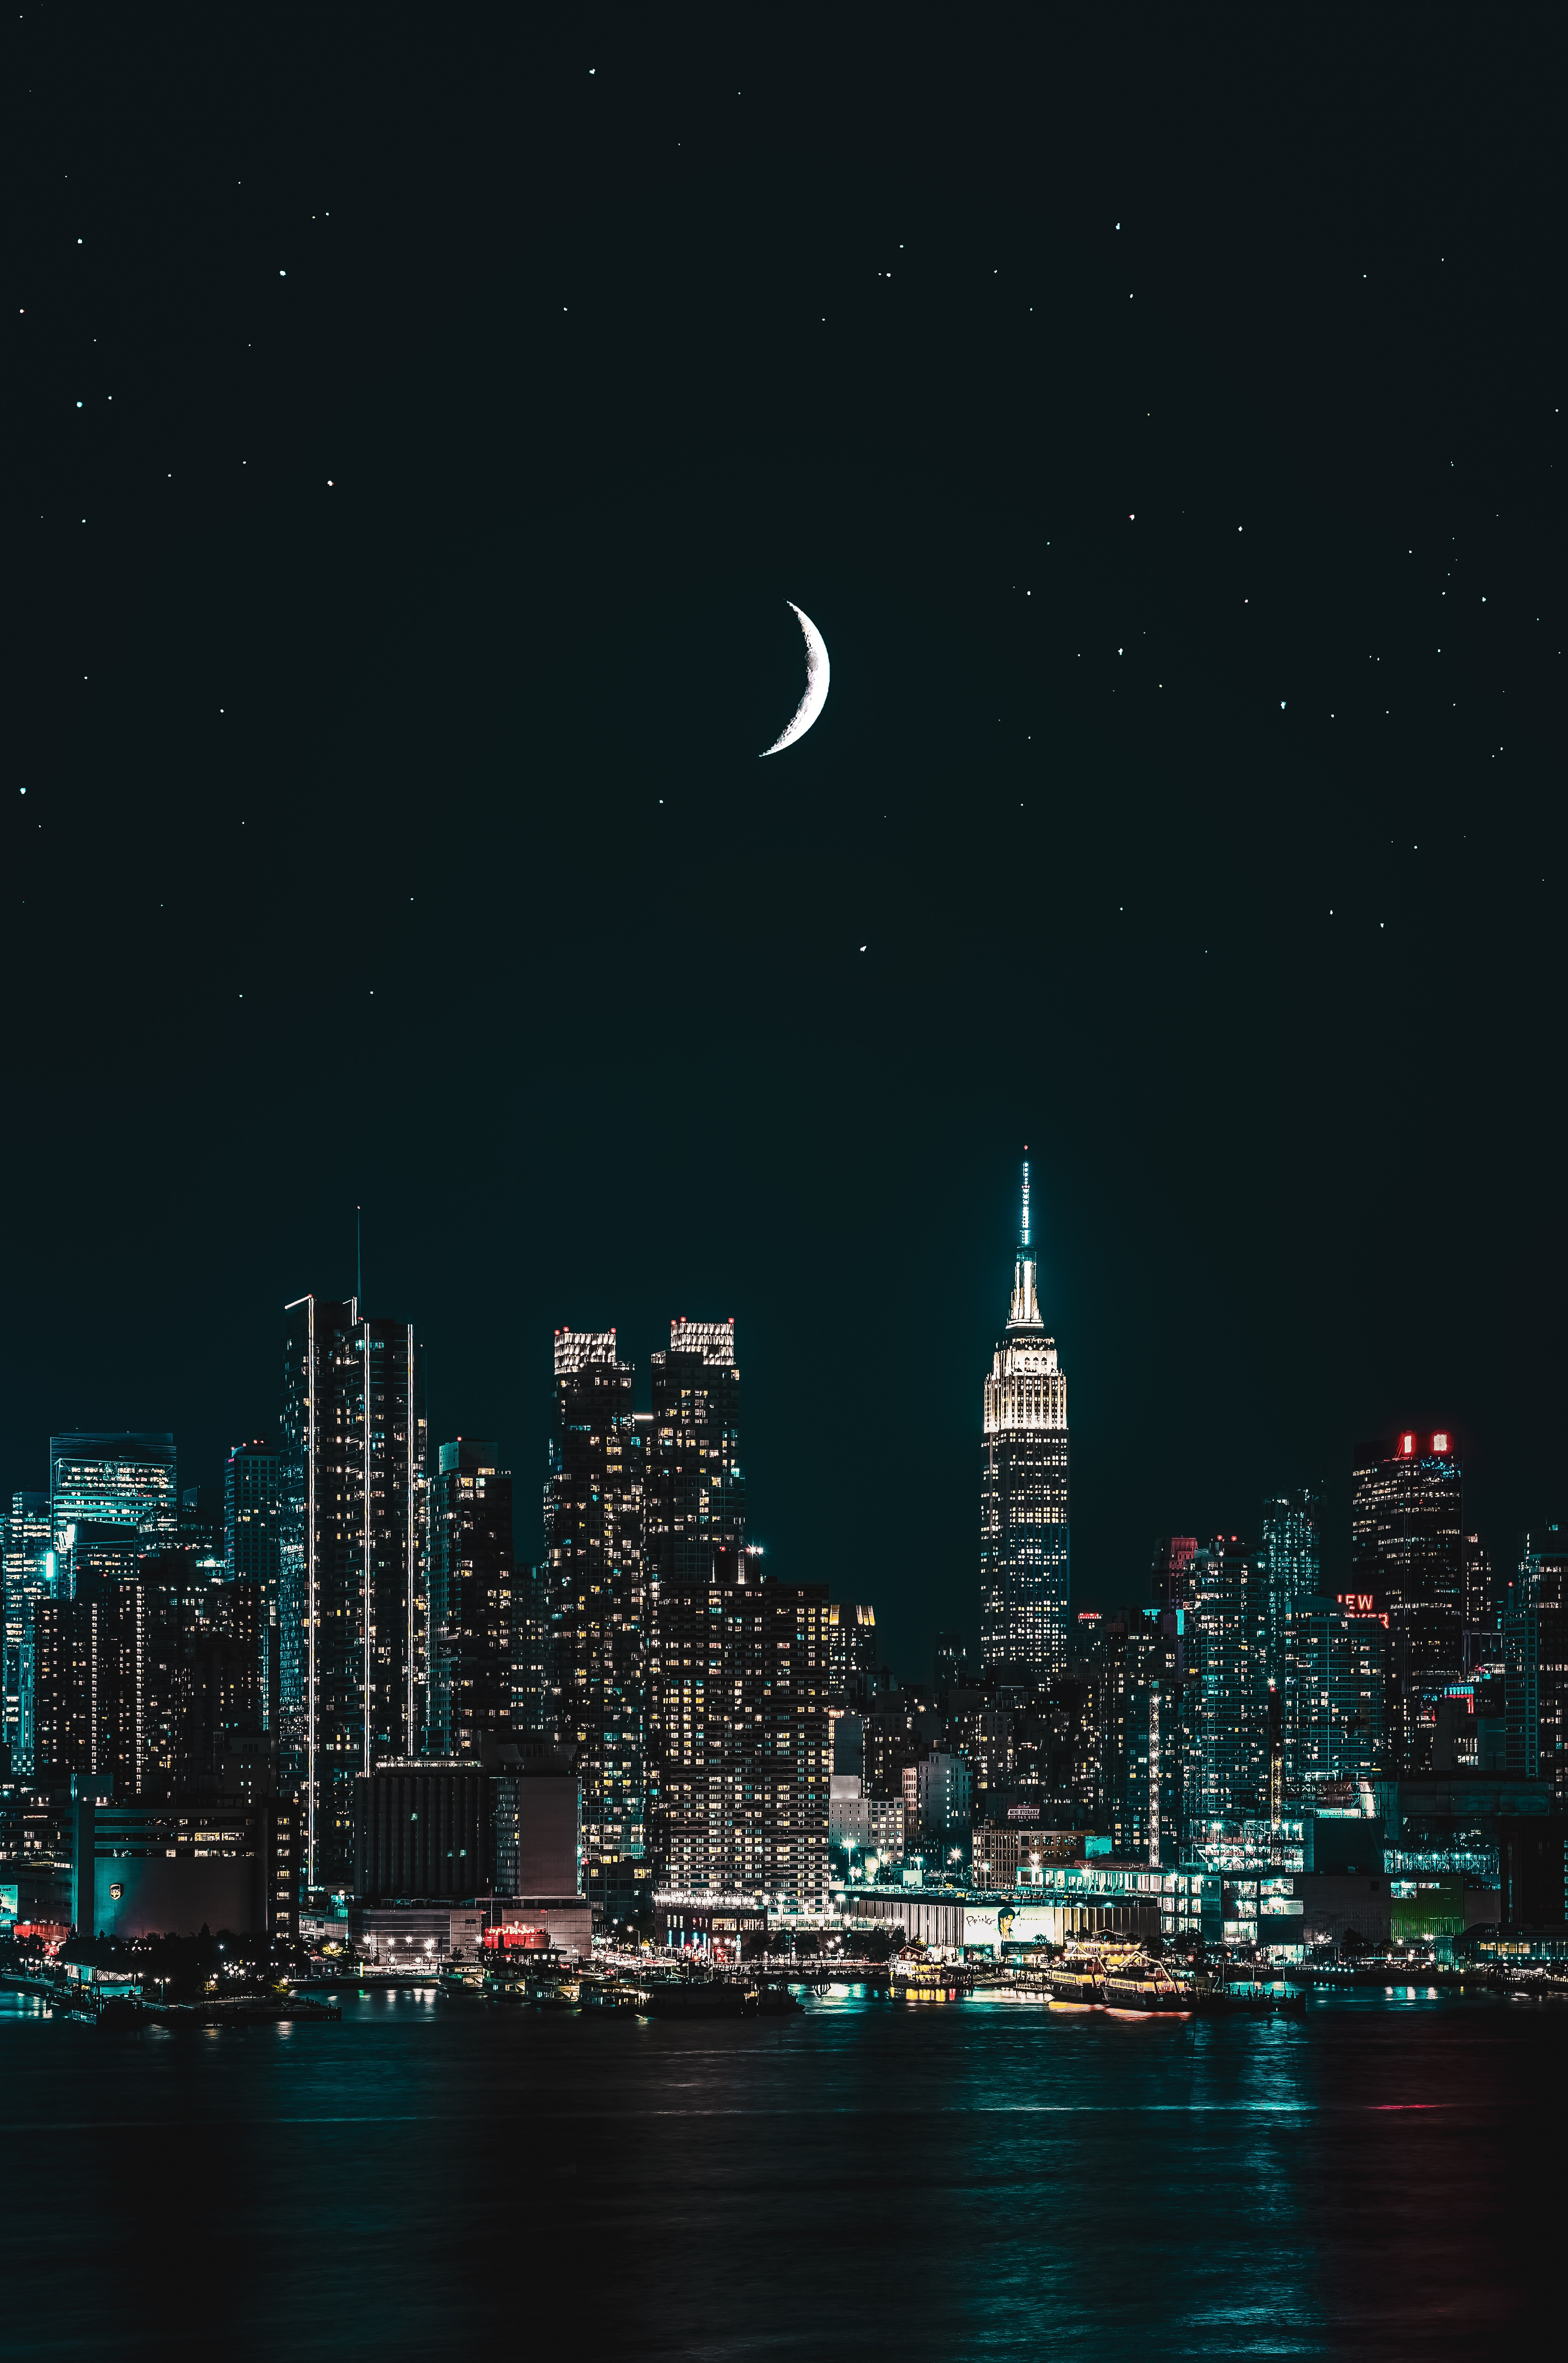 New York City 4k Wallpaper Cityscape Night City Lights Half Moon Starry Sky World 450